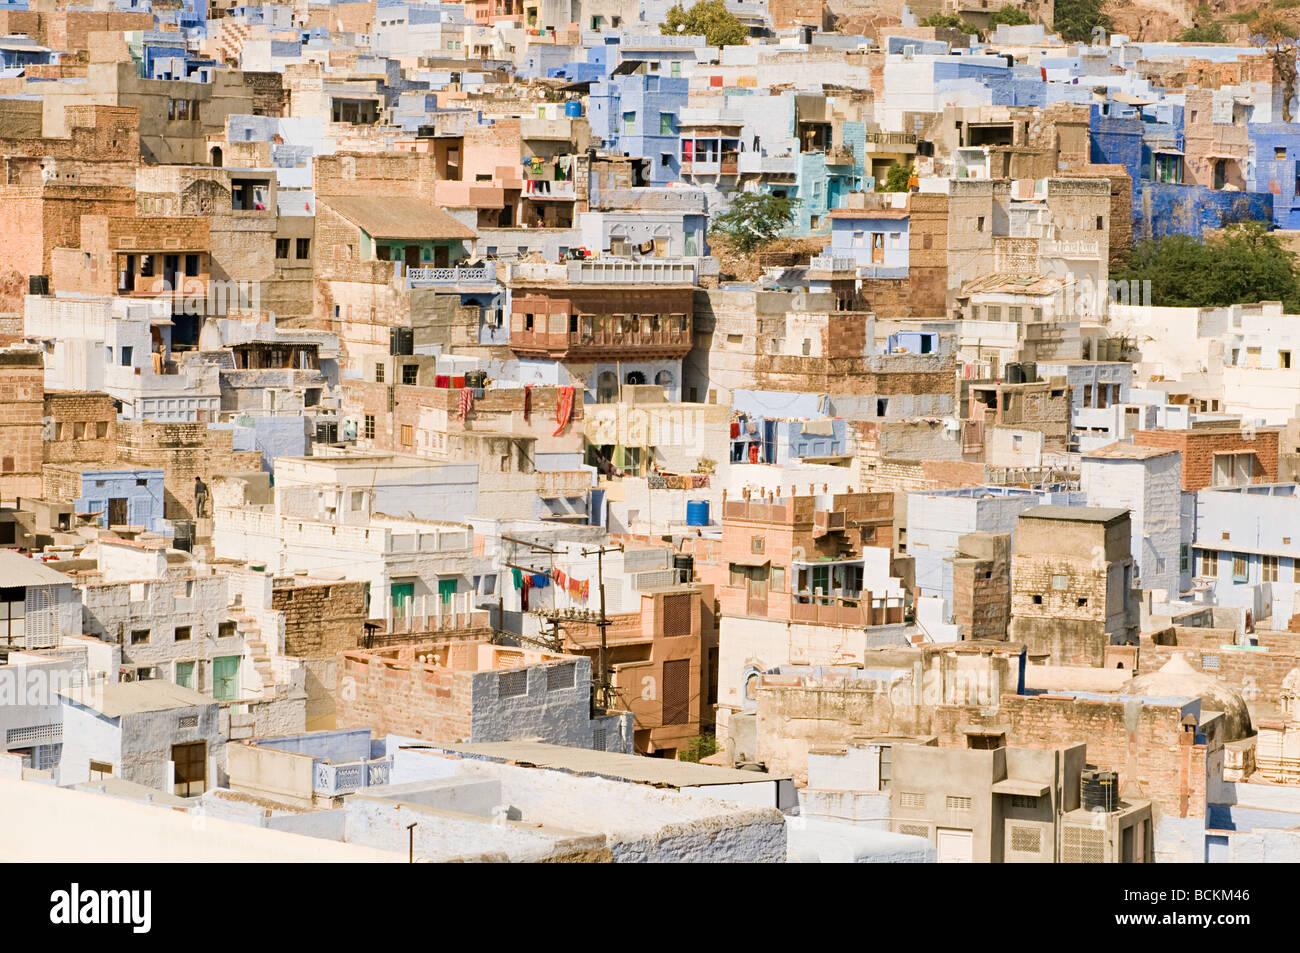 Houses in jodhpur - Stock Image